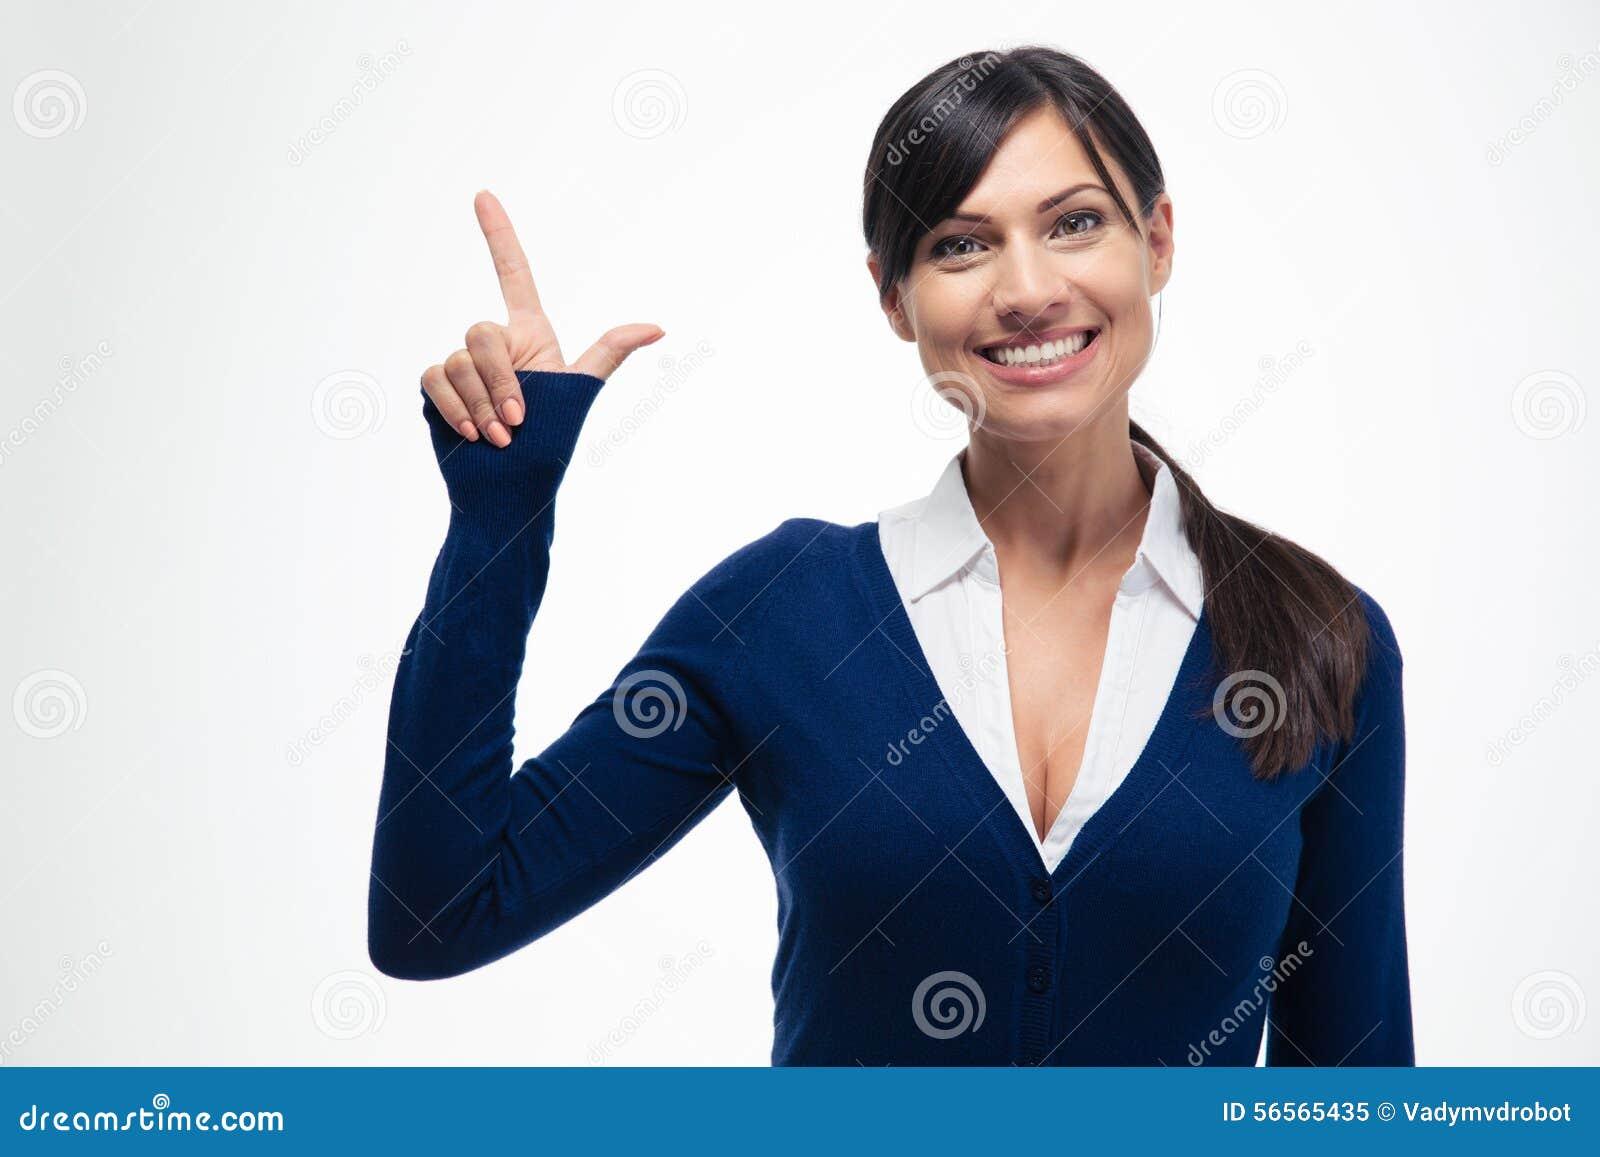 Download Χαμογελώντας επιχειρηματίας που δείχνει το δάχτυλο επάνω Στοκ Εικόνα - εικόνα από άνθρωποι, αναγγέλλει: 56565435